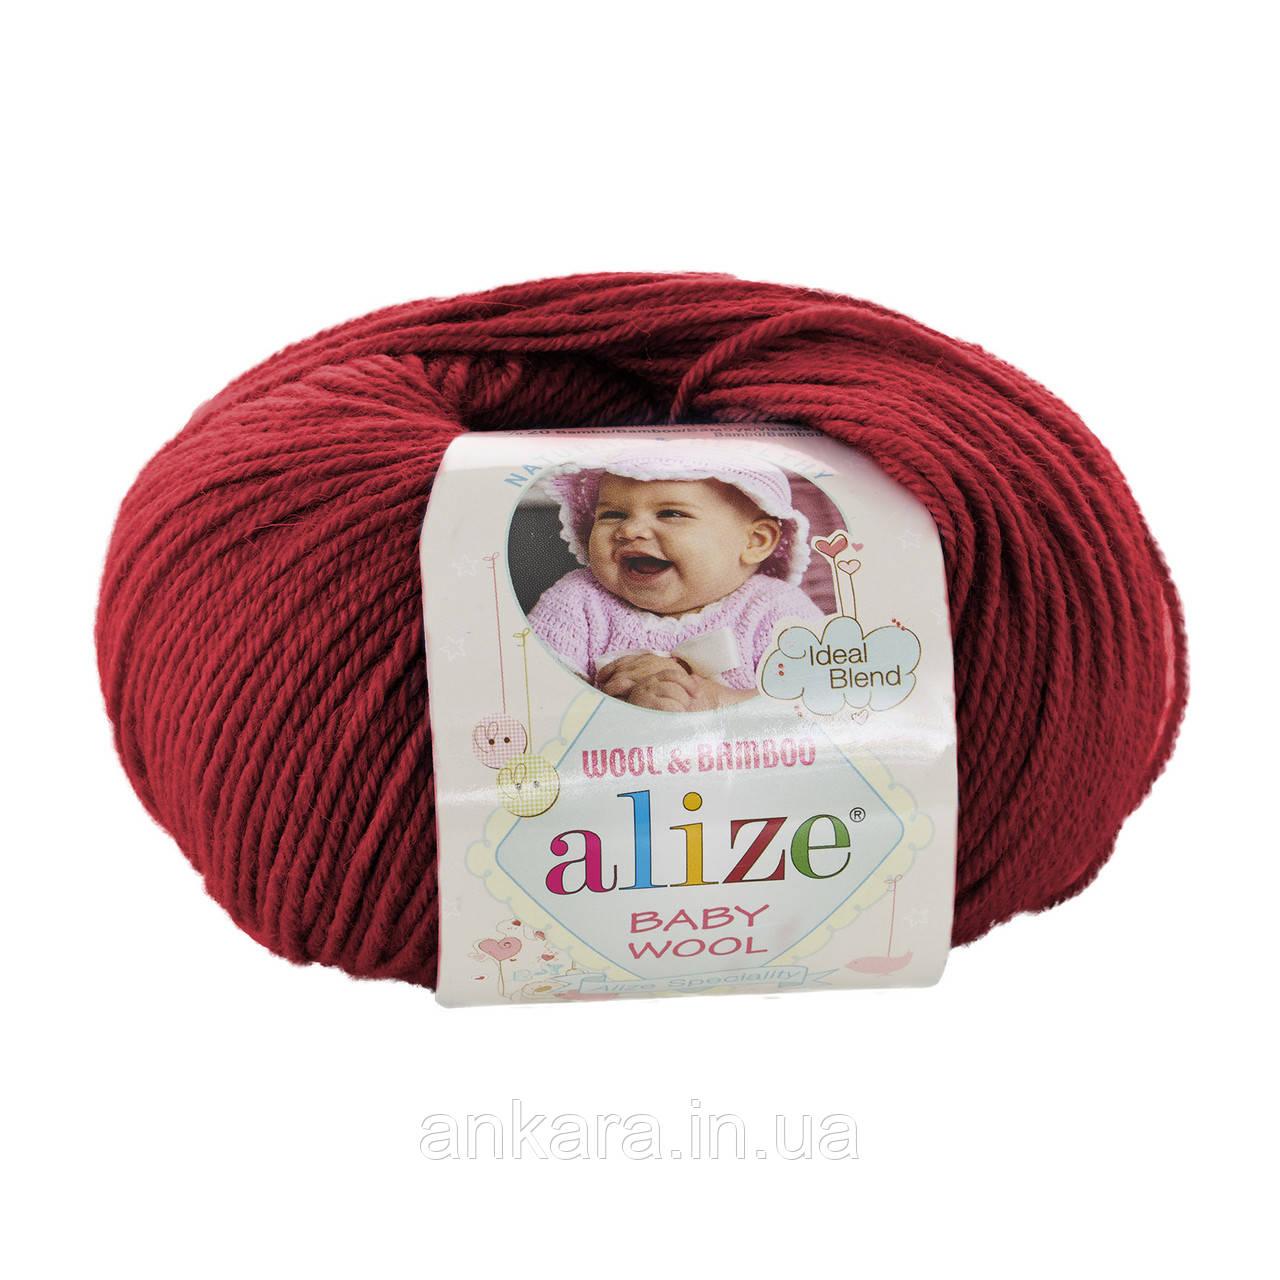 Пряжа Alize Baby Wool 106